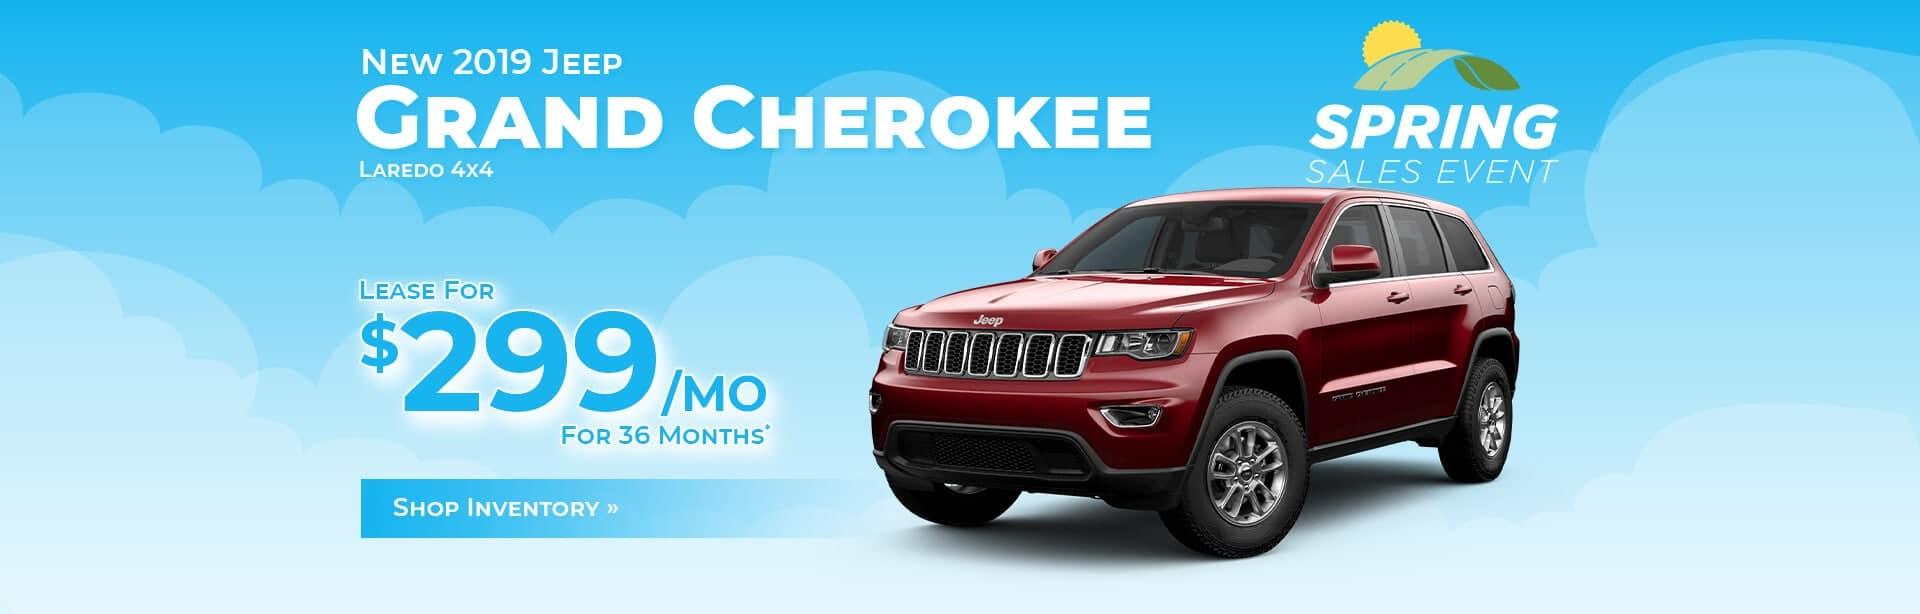 Jeep Grand Cherokee Lease Deal near Lafayette, Indiana.